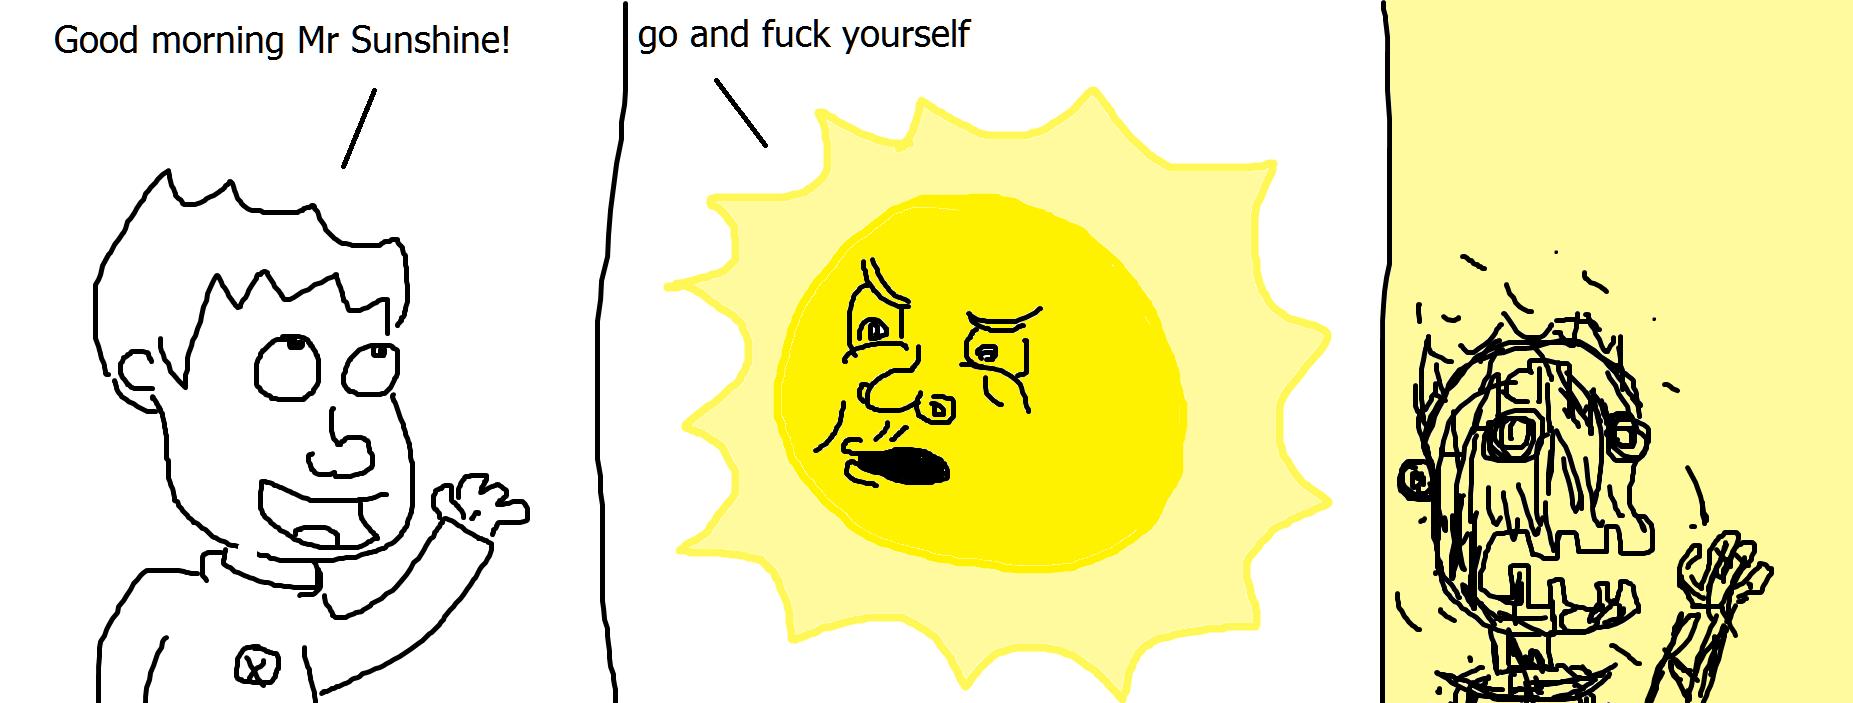 289. Good Morning Mr. Sunshine!